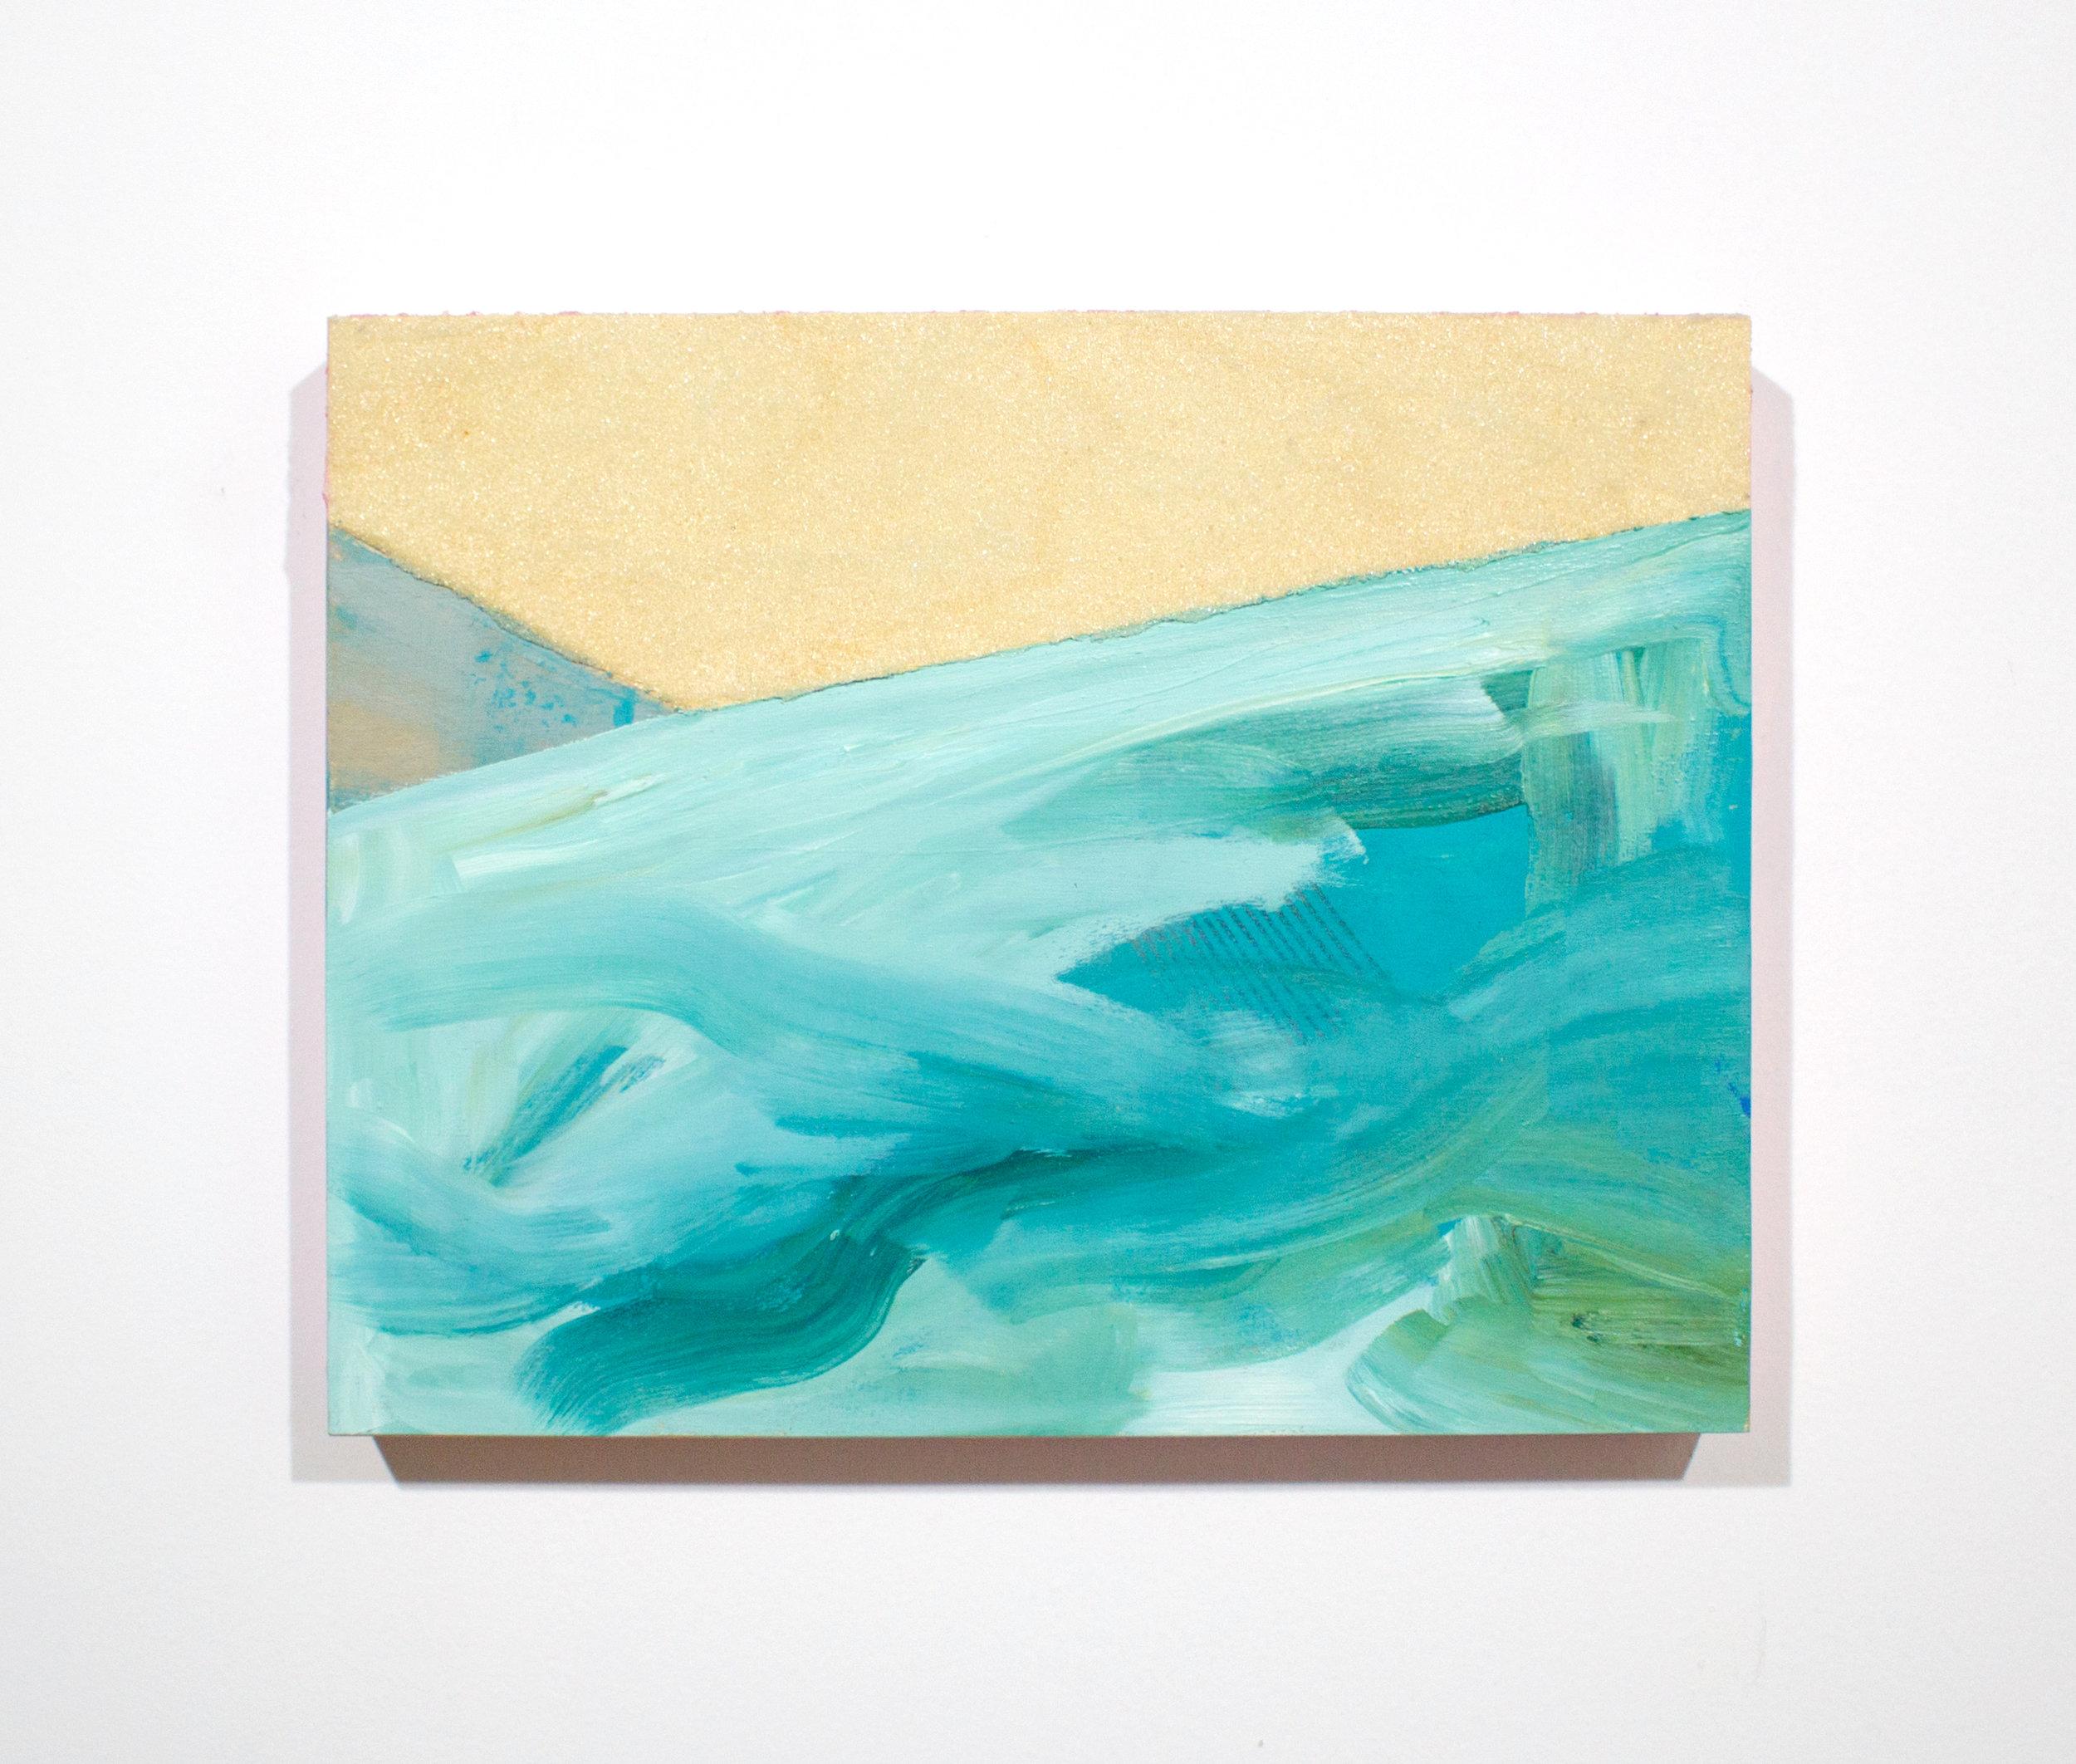 untitled 2 , 2012, tecnica mista su tavola,27 x 35 cm